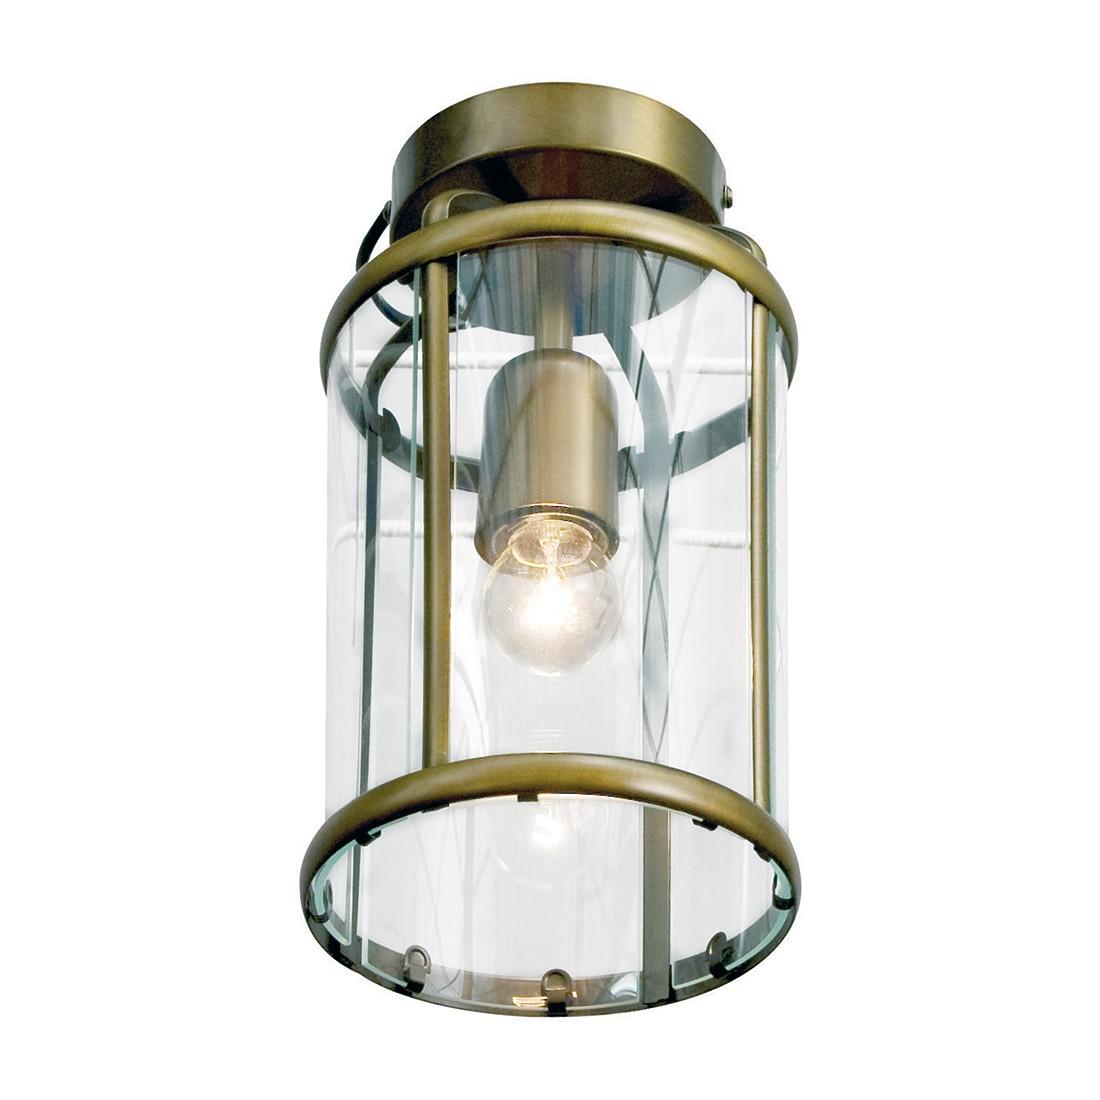 Lampada da soffitto Pimpernel, Steinhauer